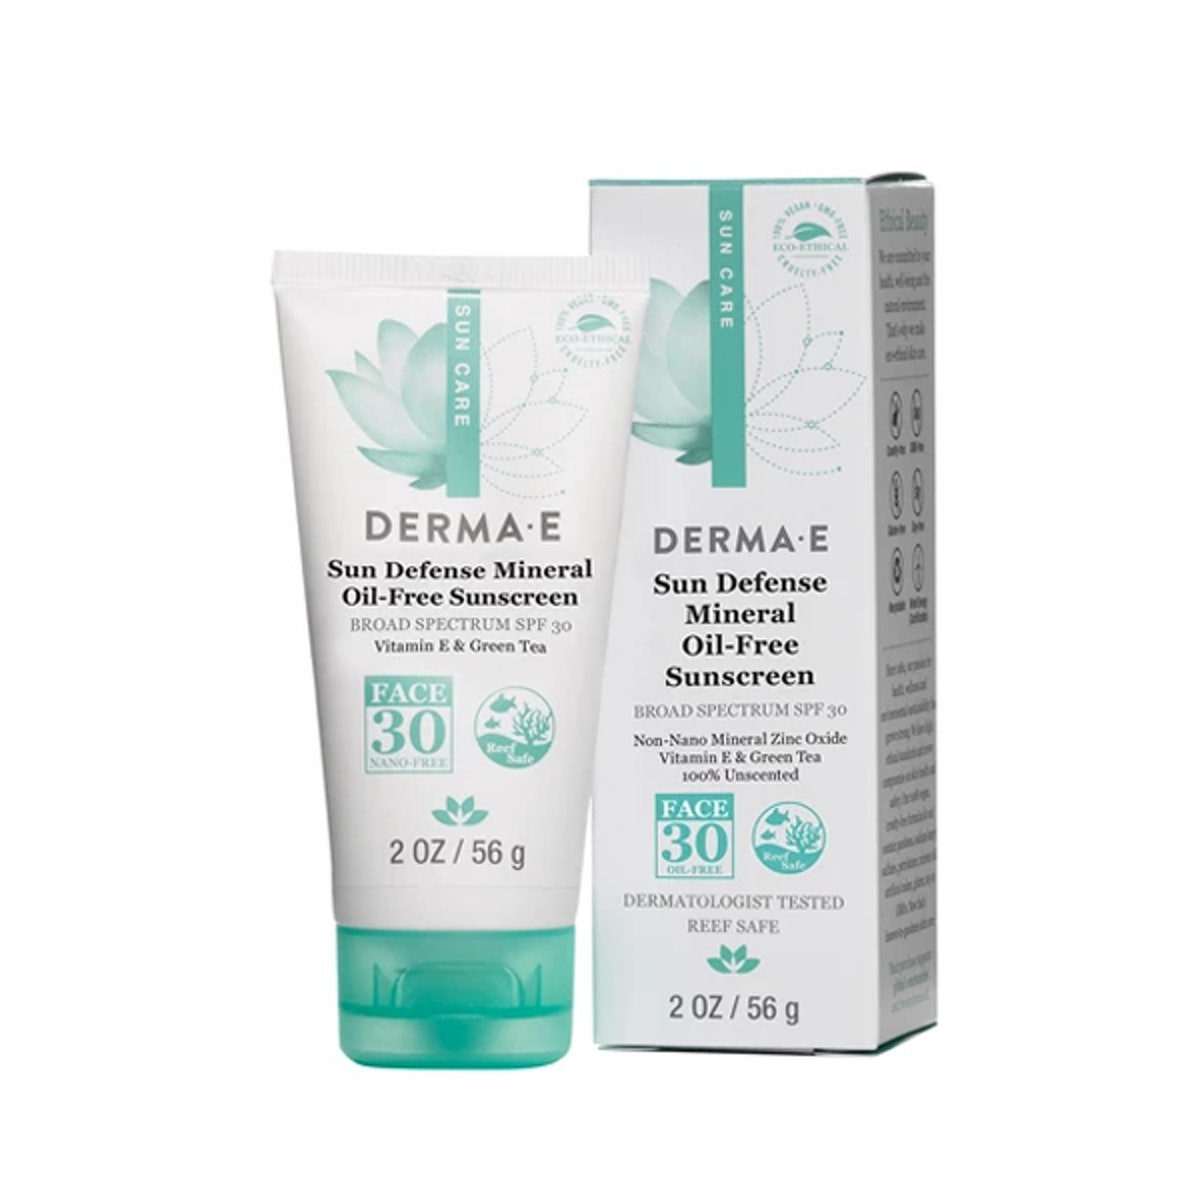 Sun Defense Mineral Oil-Free Sunscreen Face